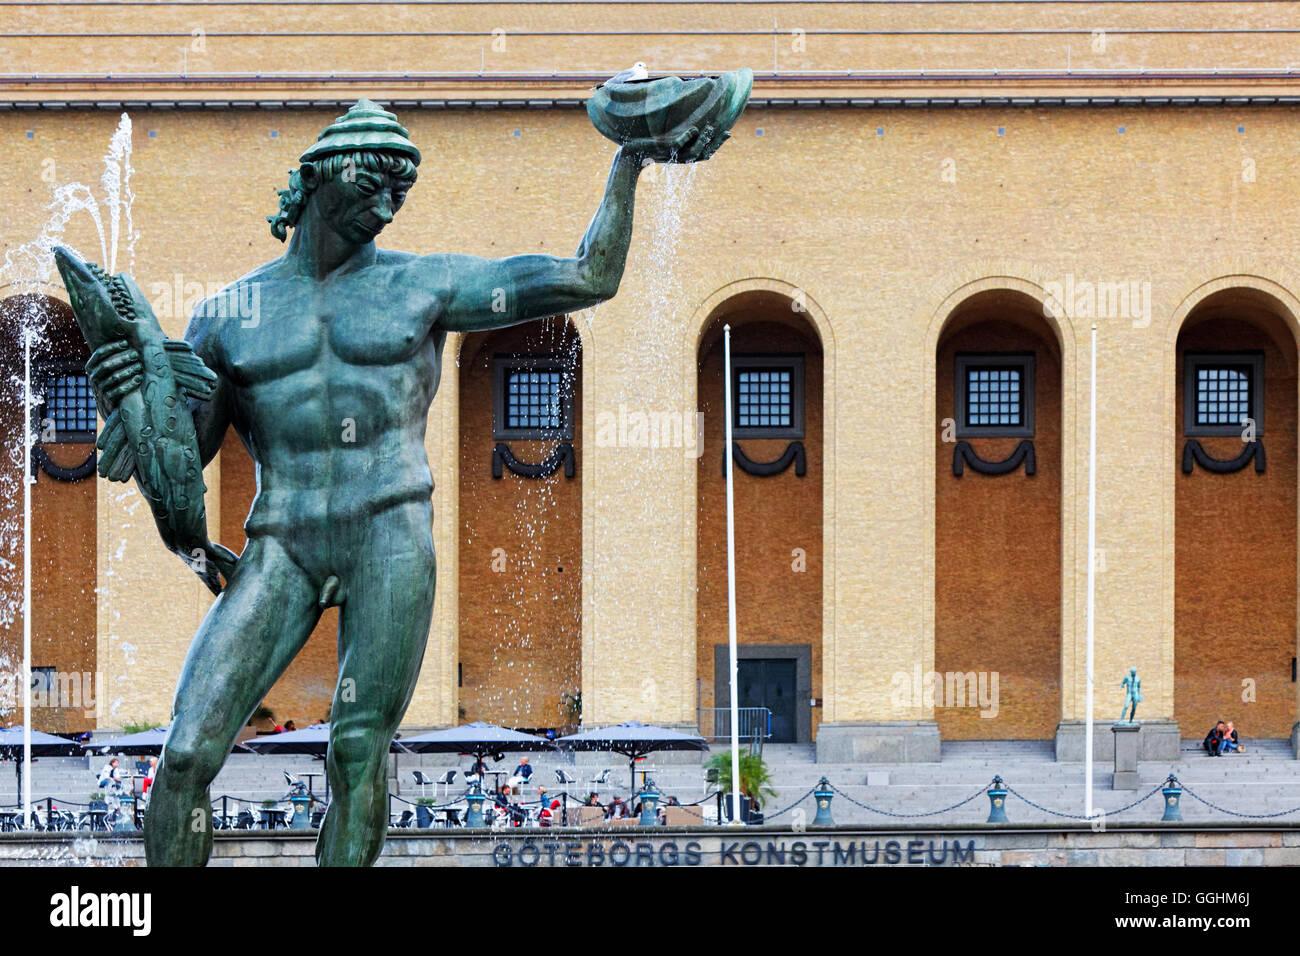 Poseidon statua da Carl Milles davanti al Museo di Arte, Göteborg, Svezia Immagini Stock